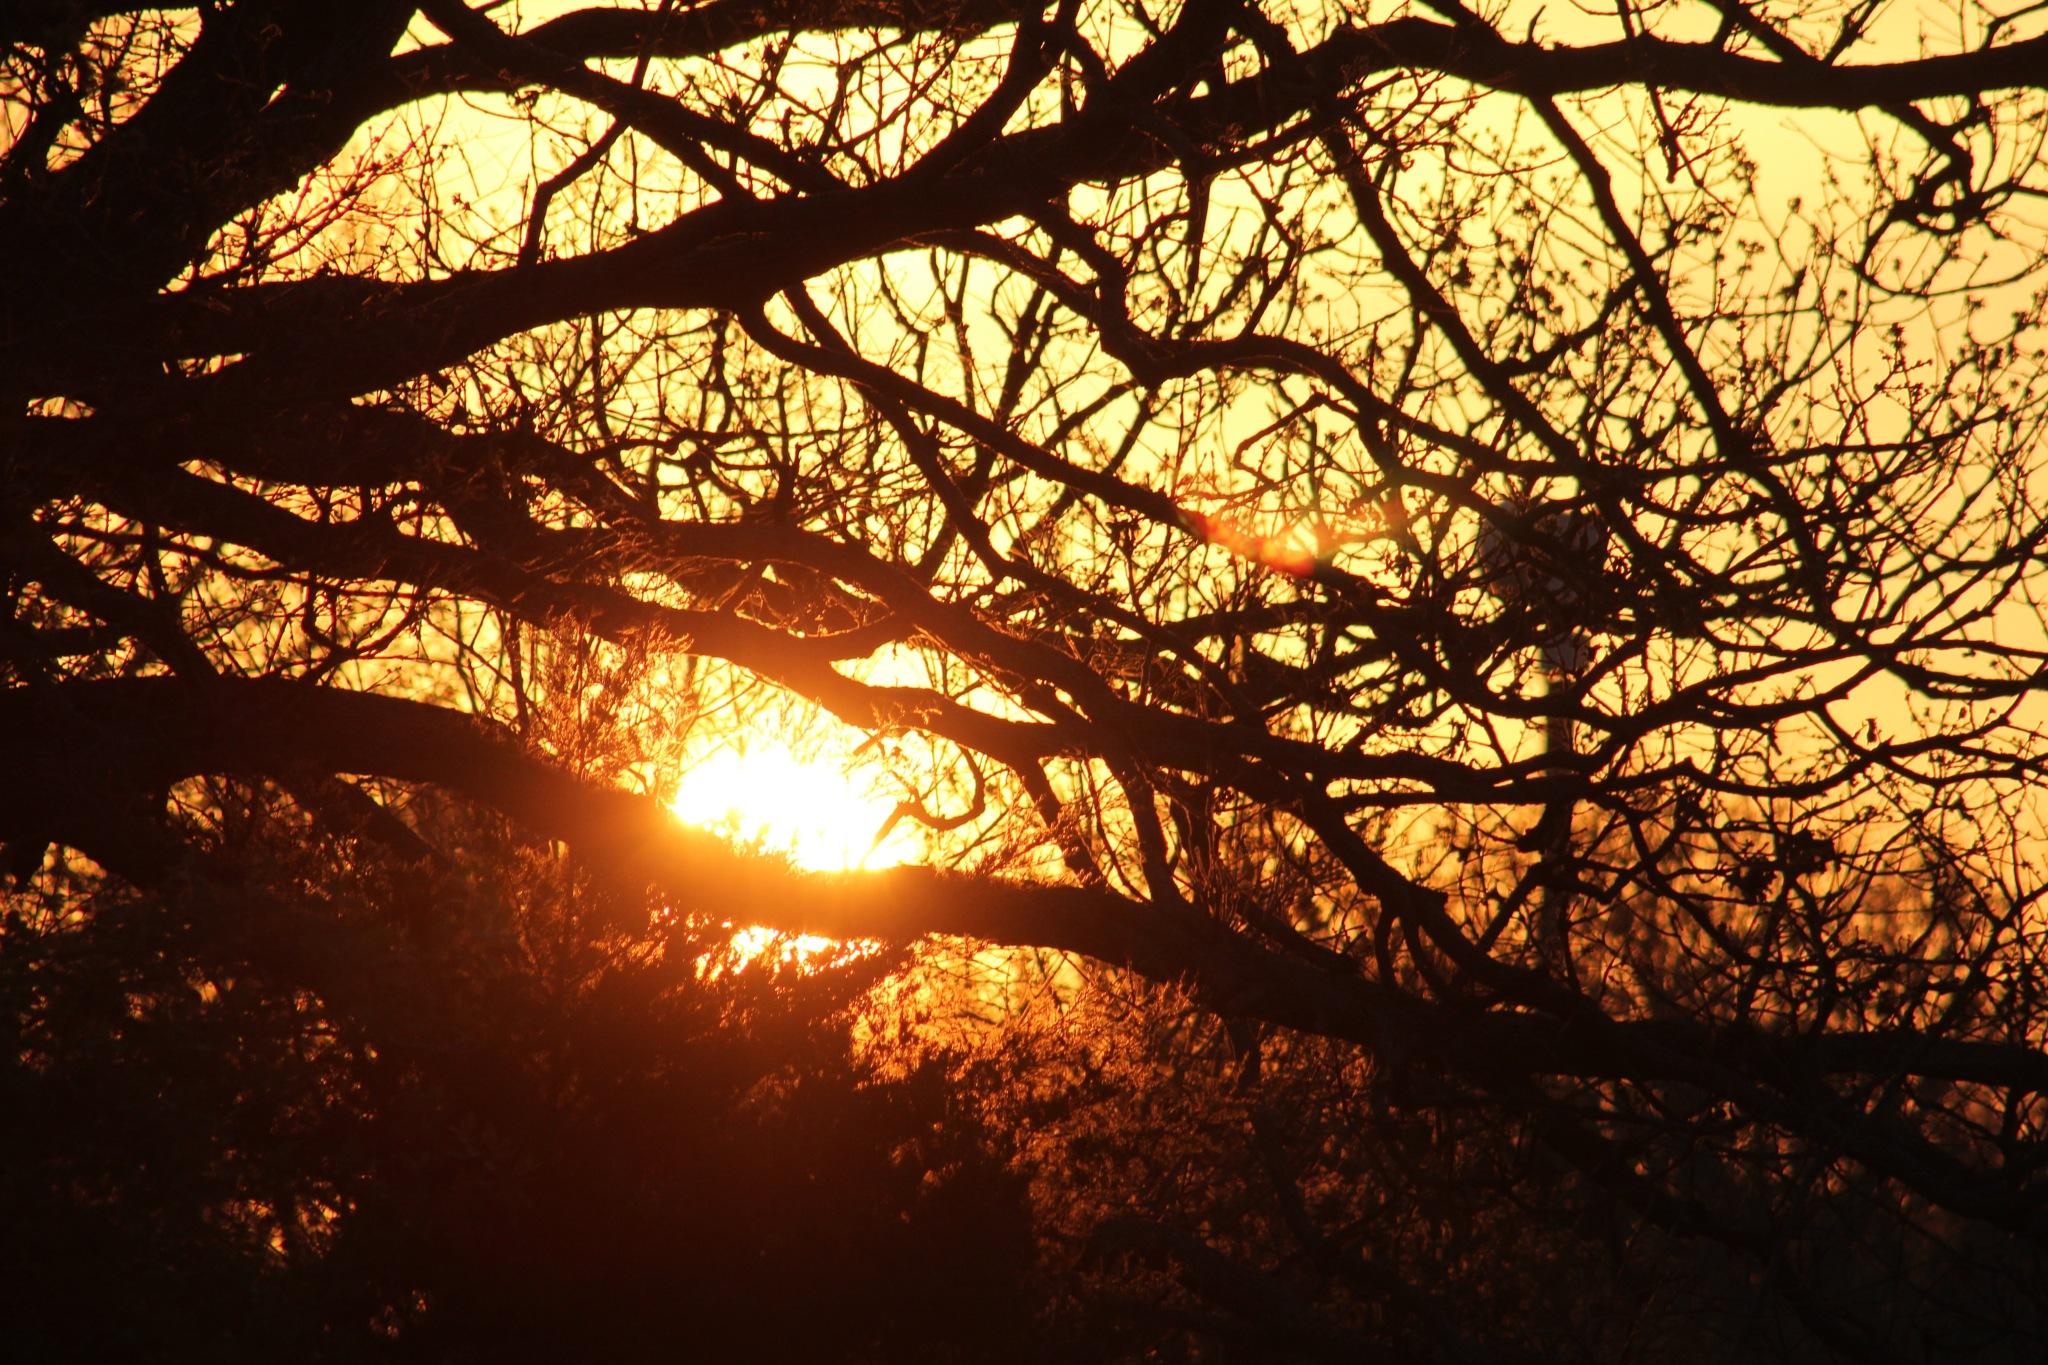 GOOD MORNIN MORNING HELLO SUNSHINE by Tara Smith